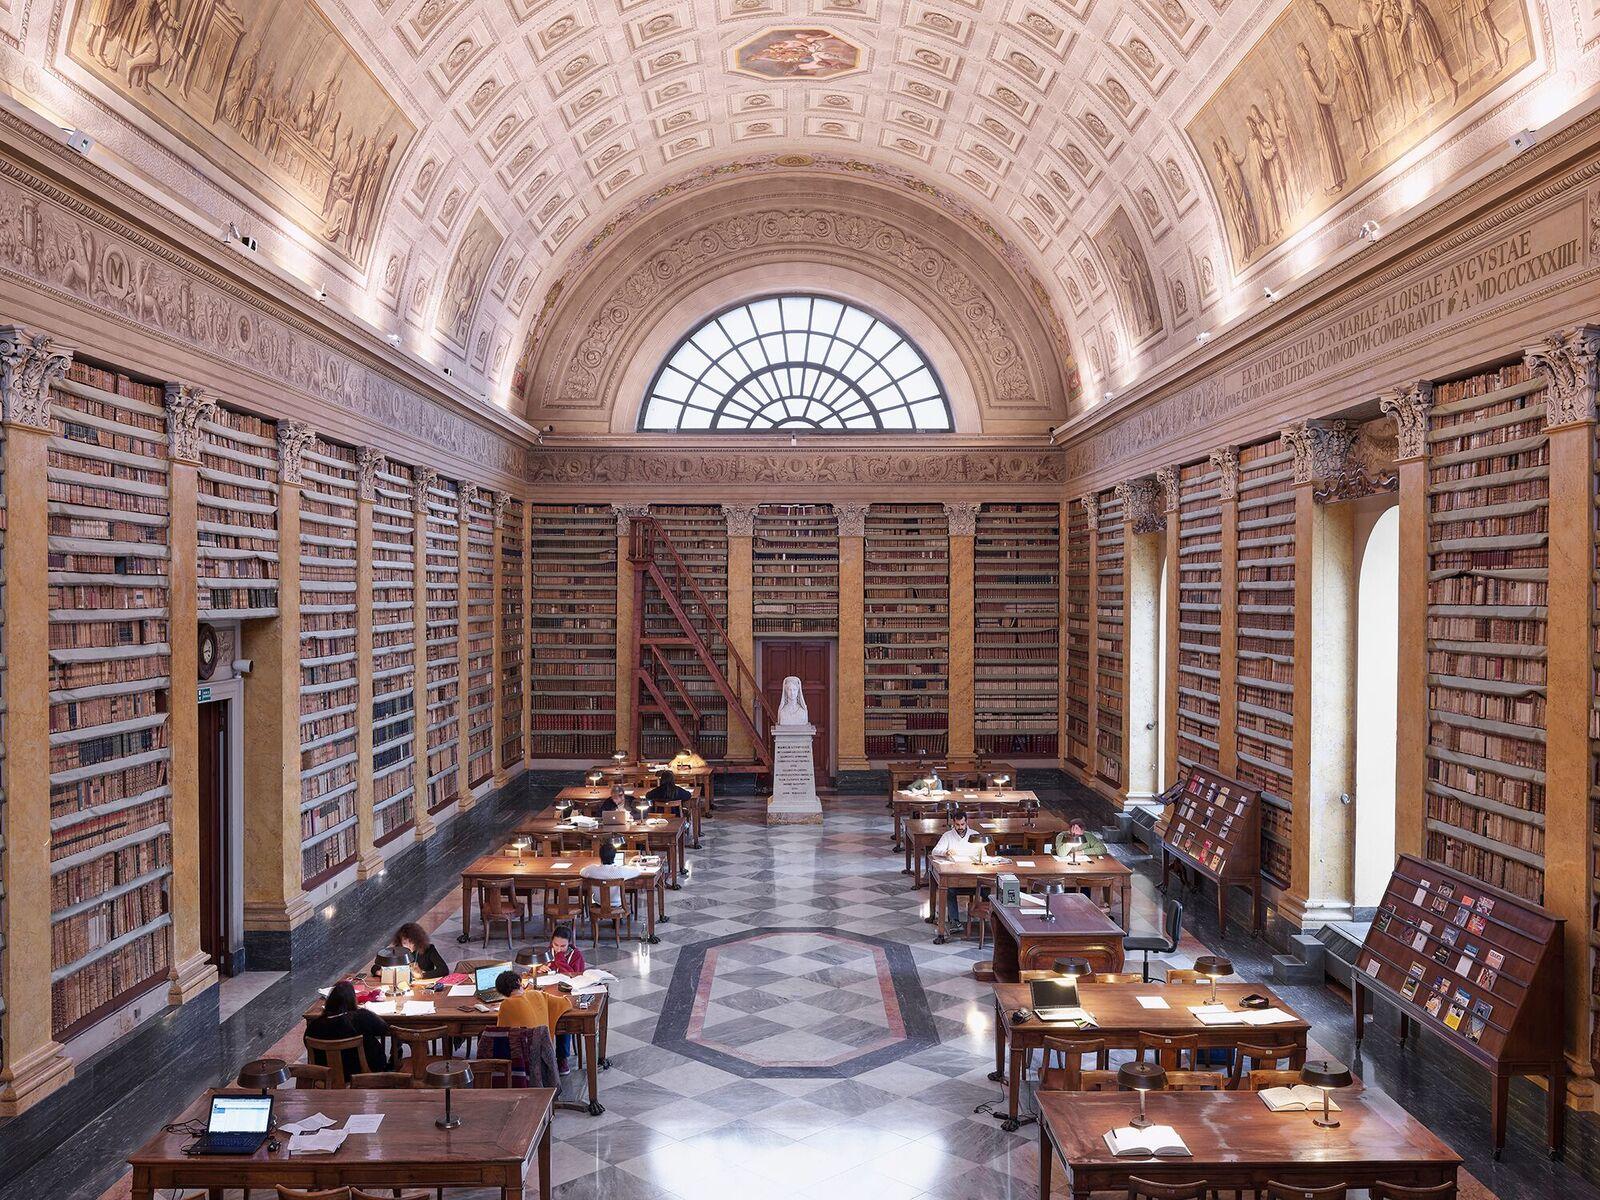 immagine per Biblioteca Palatina, Salone Maria Luigia. Ph. Giovanni Hanninen